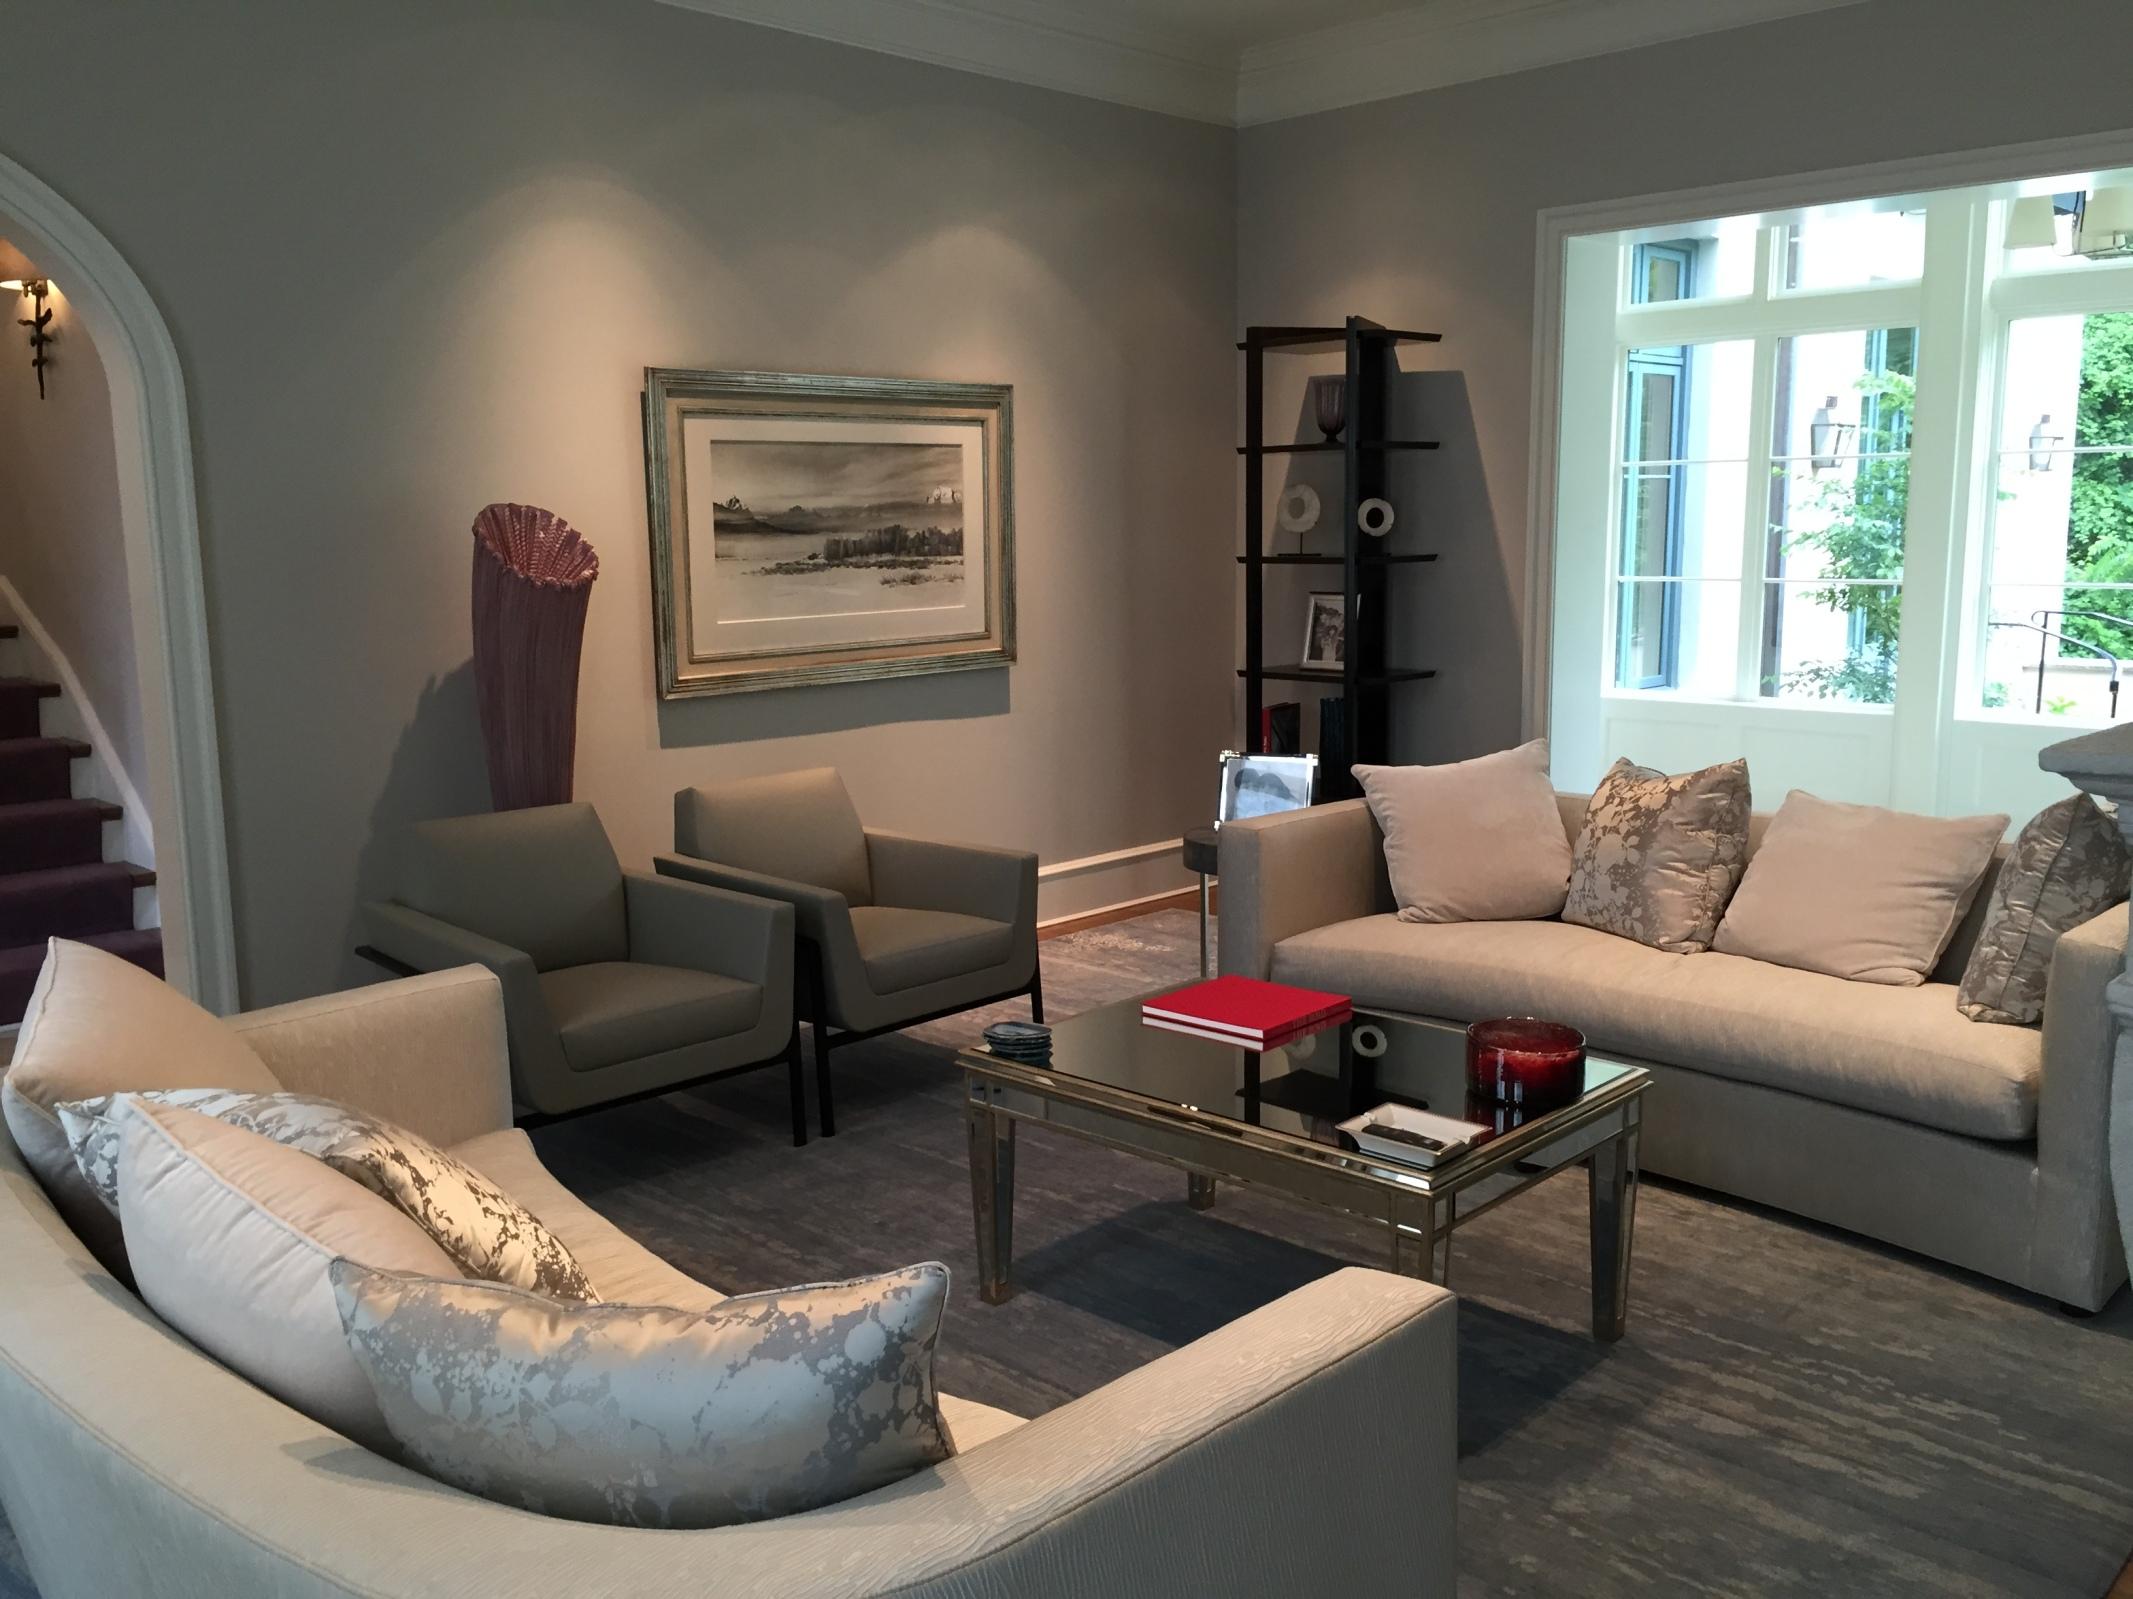 client light residential carmichael portfolio res design interior lighting sestak hi